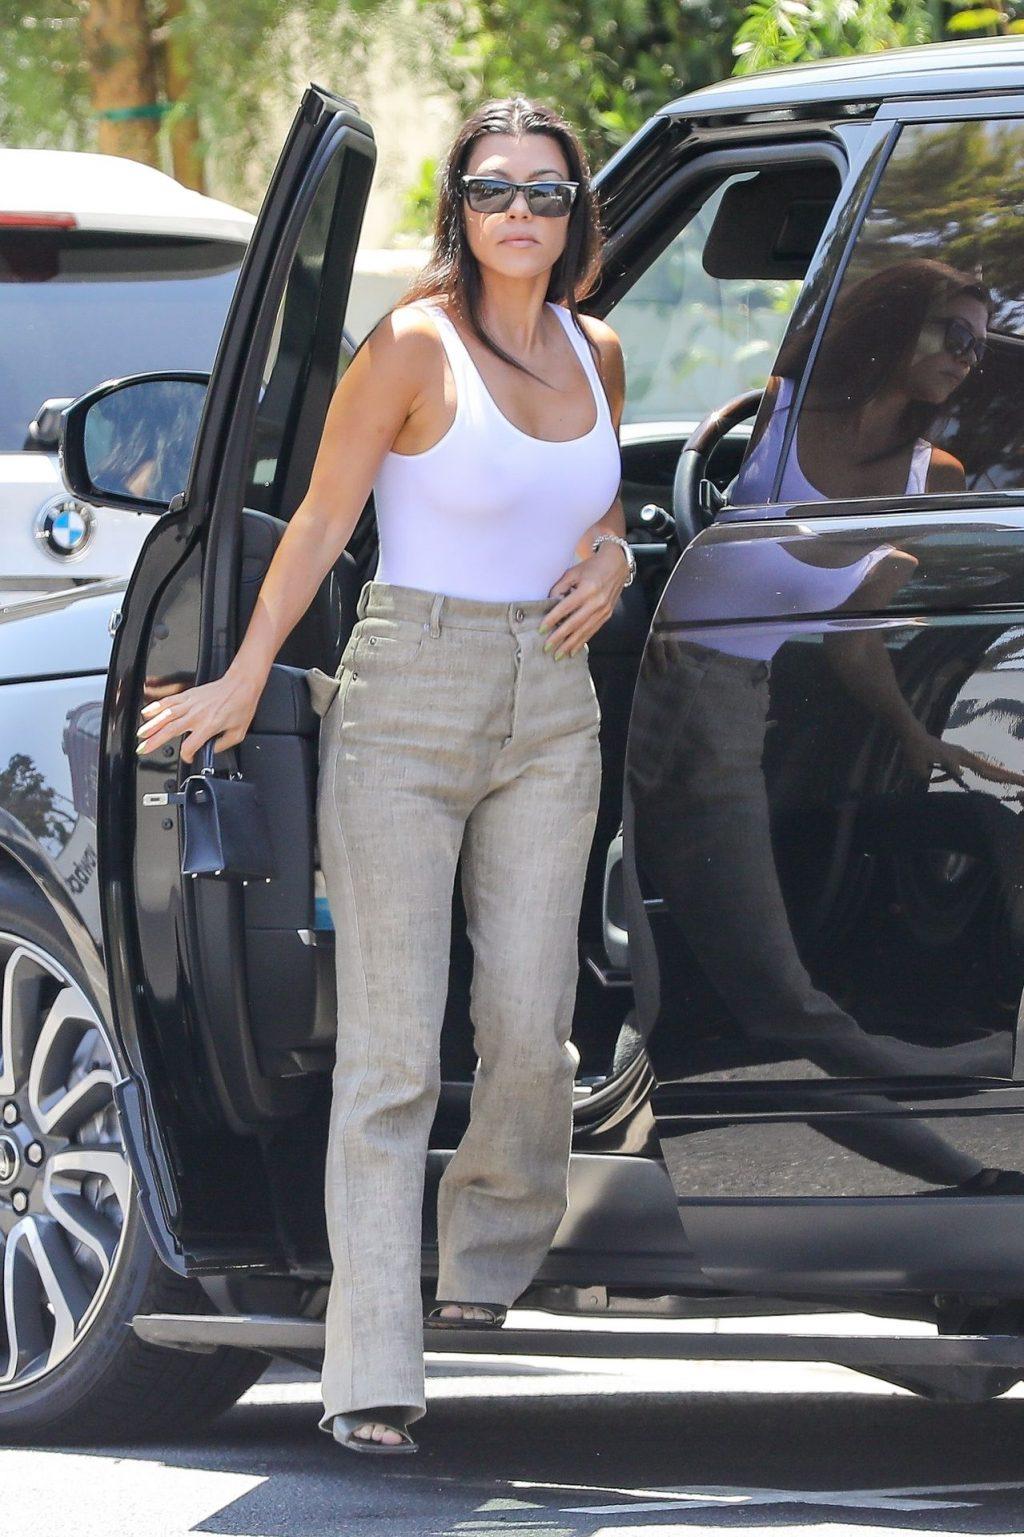 Kourtney Kardashian See Through Thefappeningblog Com 6 1024x